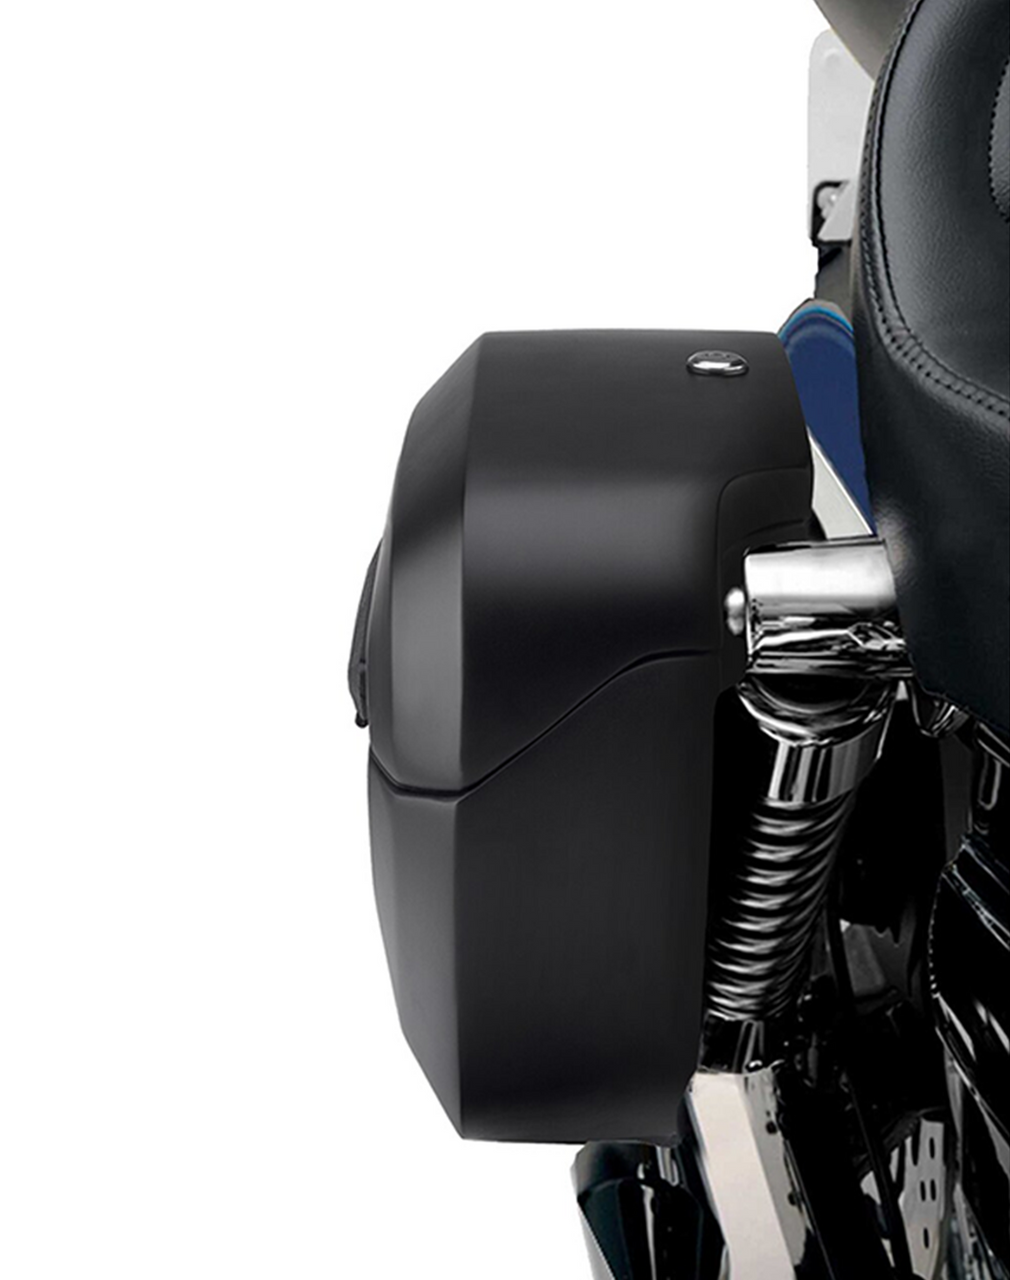 Viking Lamellar Shock Cutout Extra Large Matte Motorcycle Hard Saddlebags For Honda VTX 1800 S Shock Cutout View